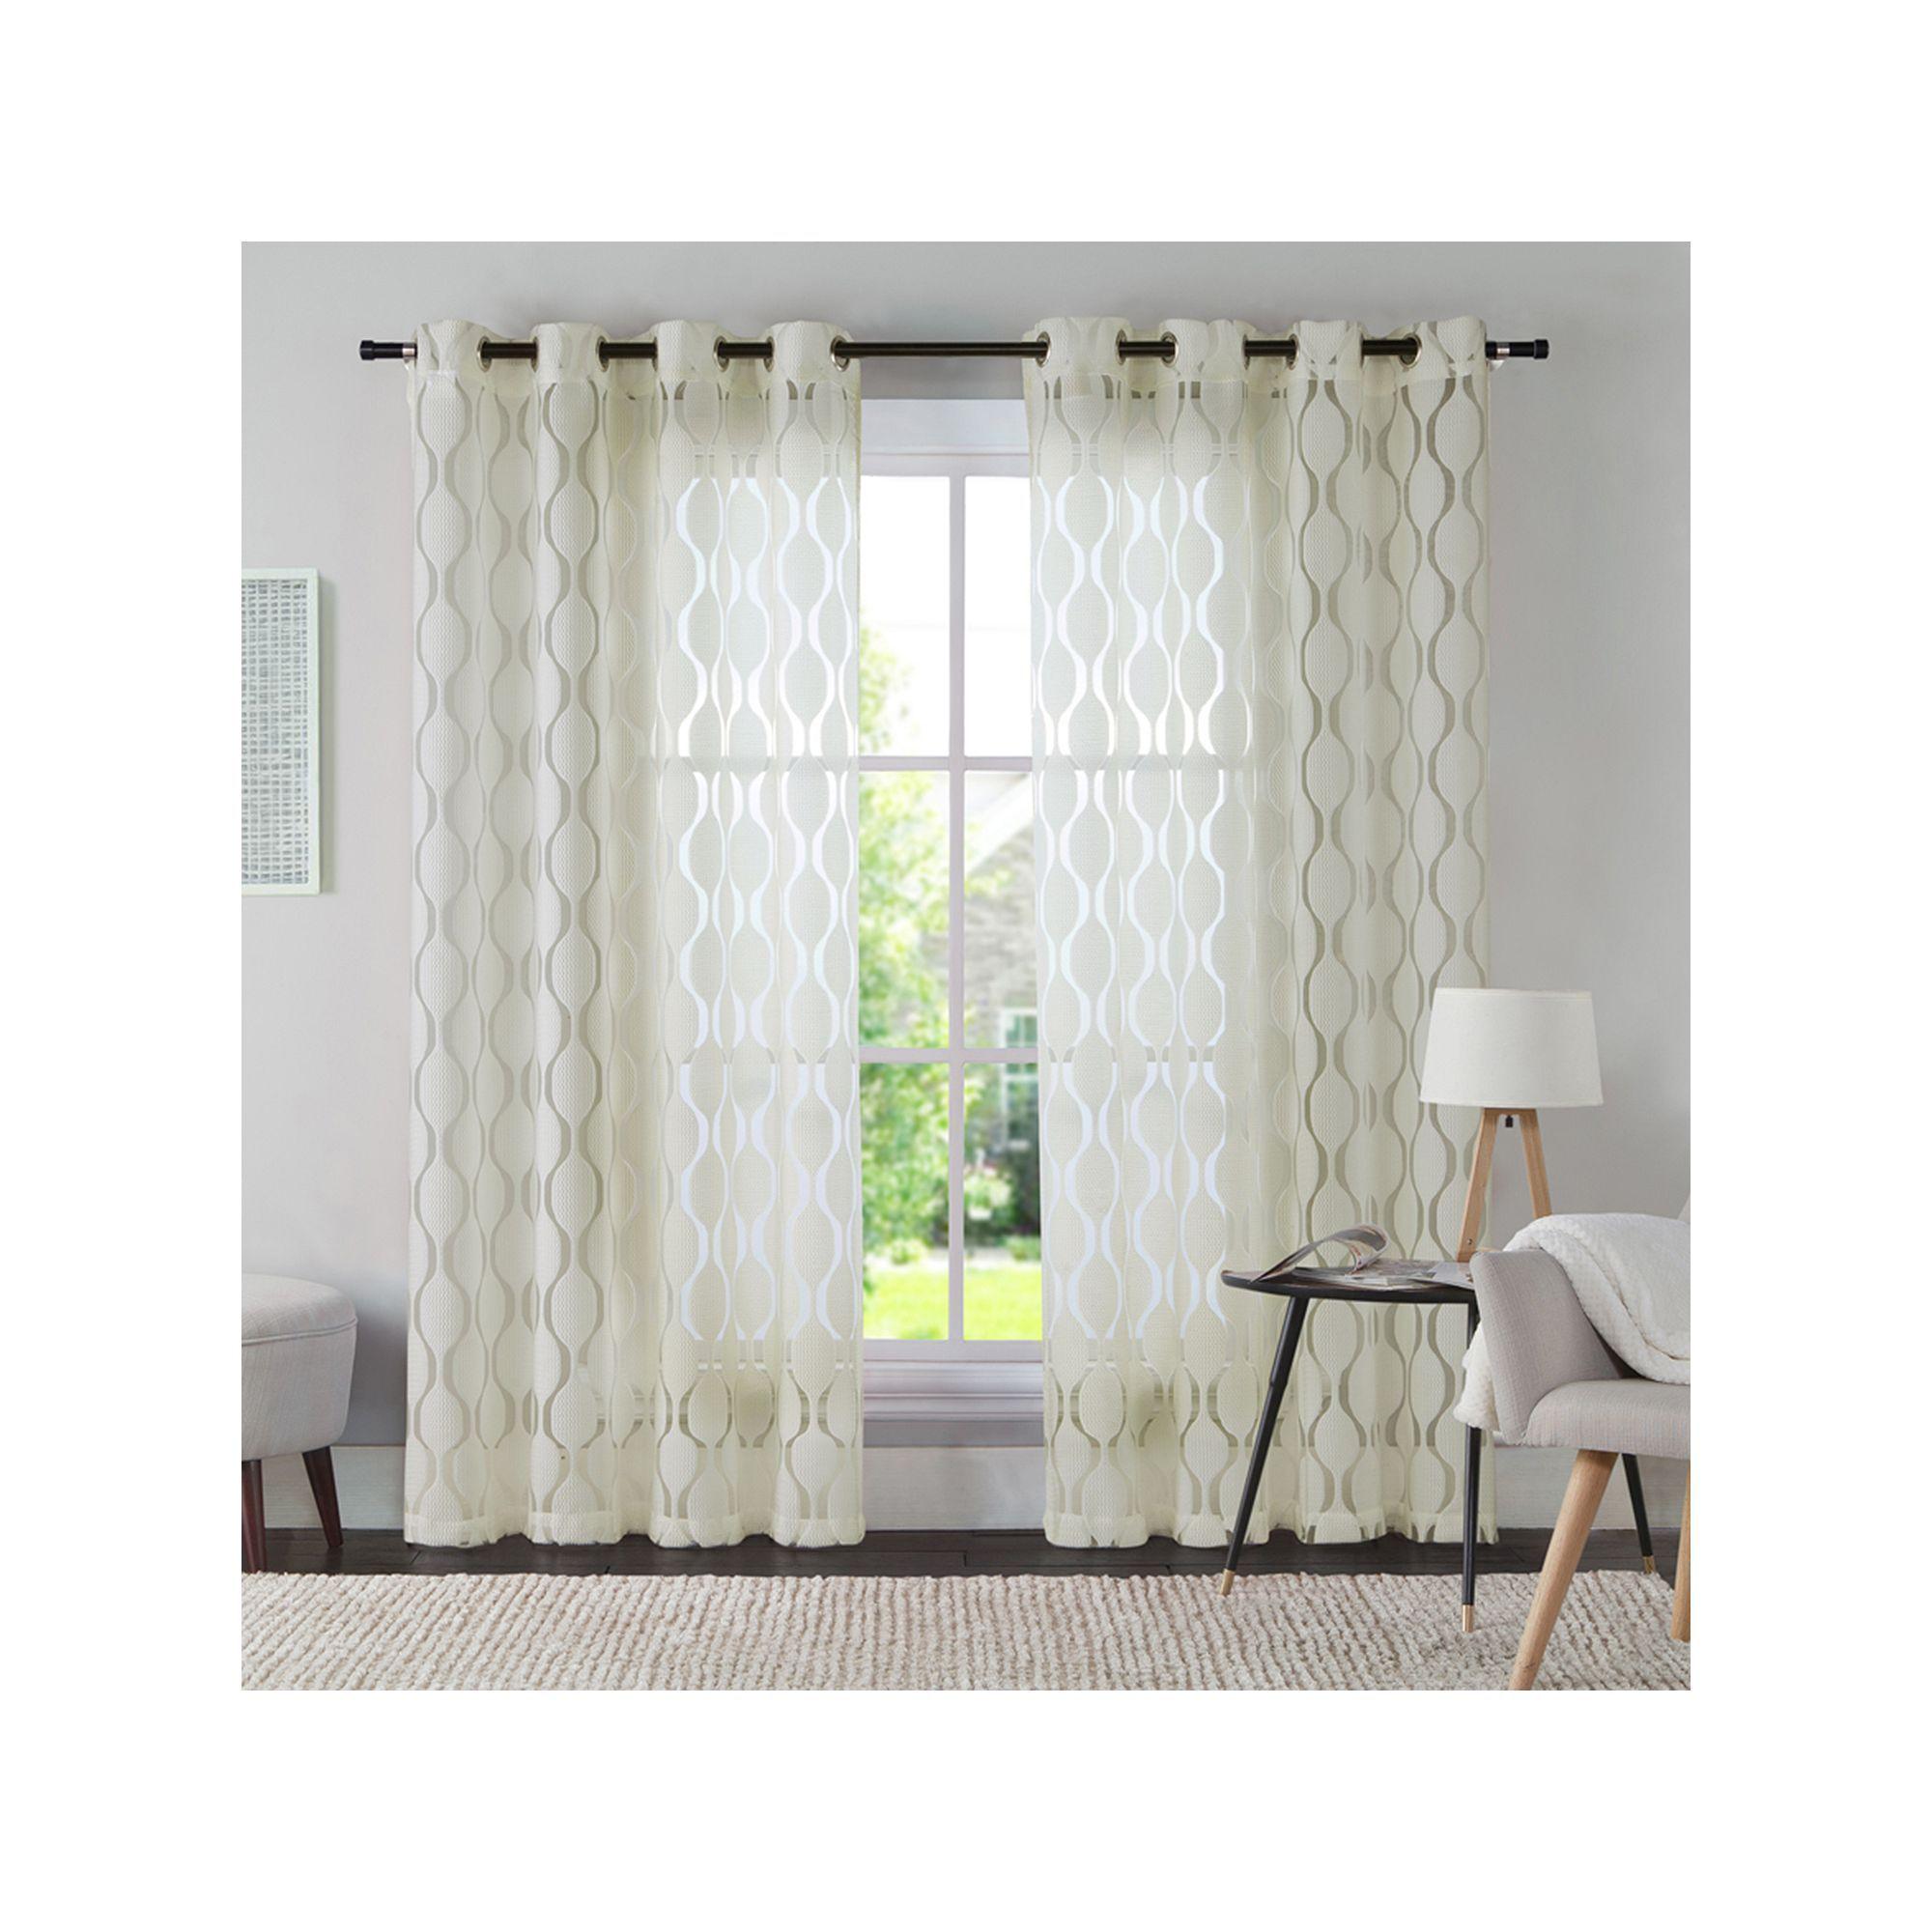 Kitchen Window Treatments Ideas Contemporary Table Stupendous Useful Rustic Curtains Burlap Farmhouse